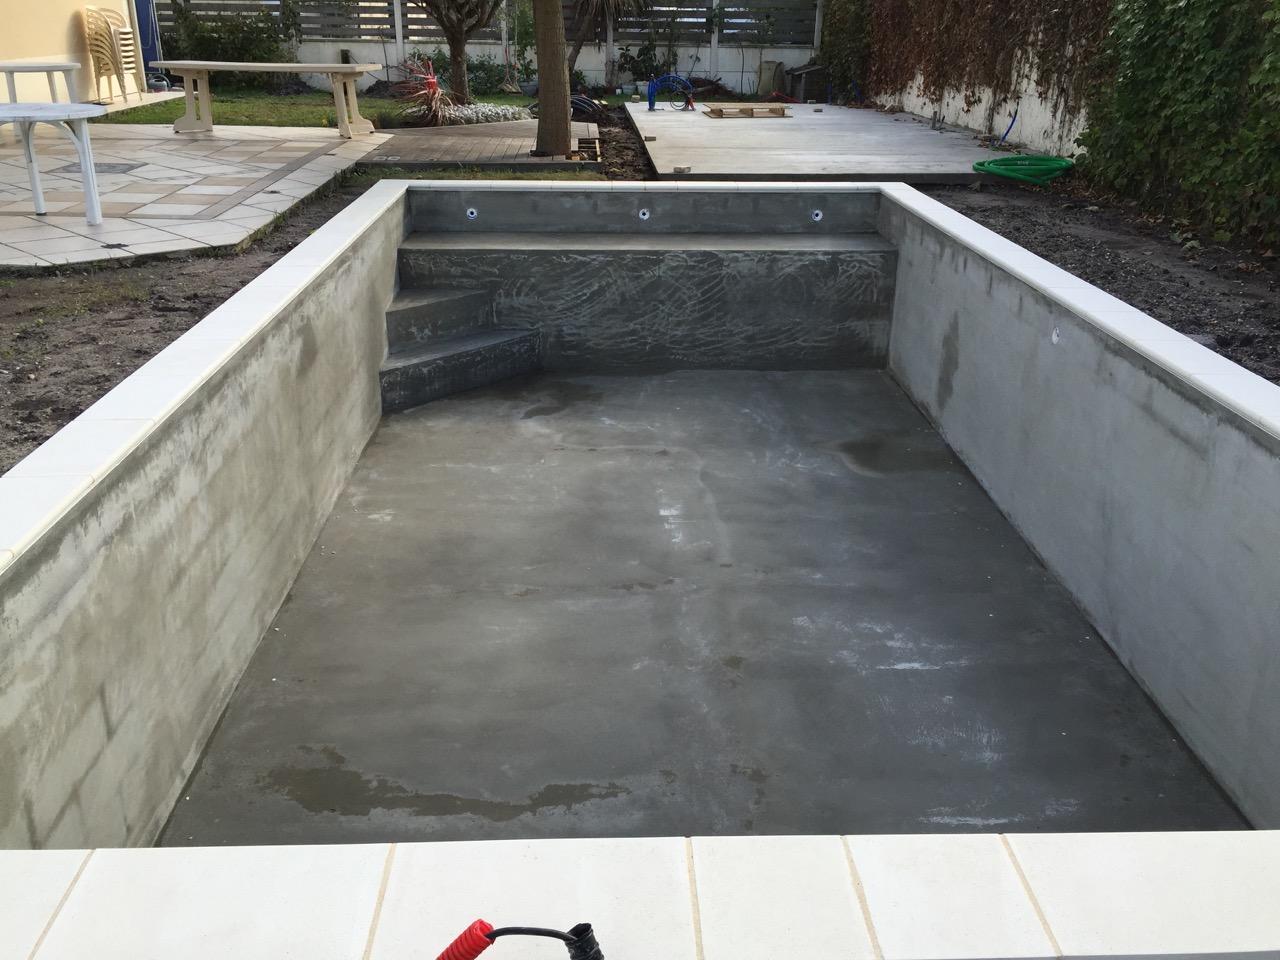 Piscine traditionelle 8x4 m poolhouse red cedar for Distance local technique piscine